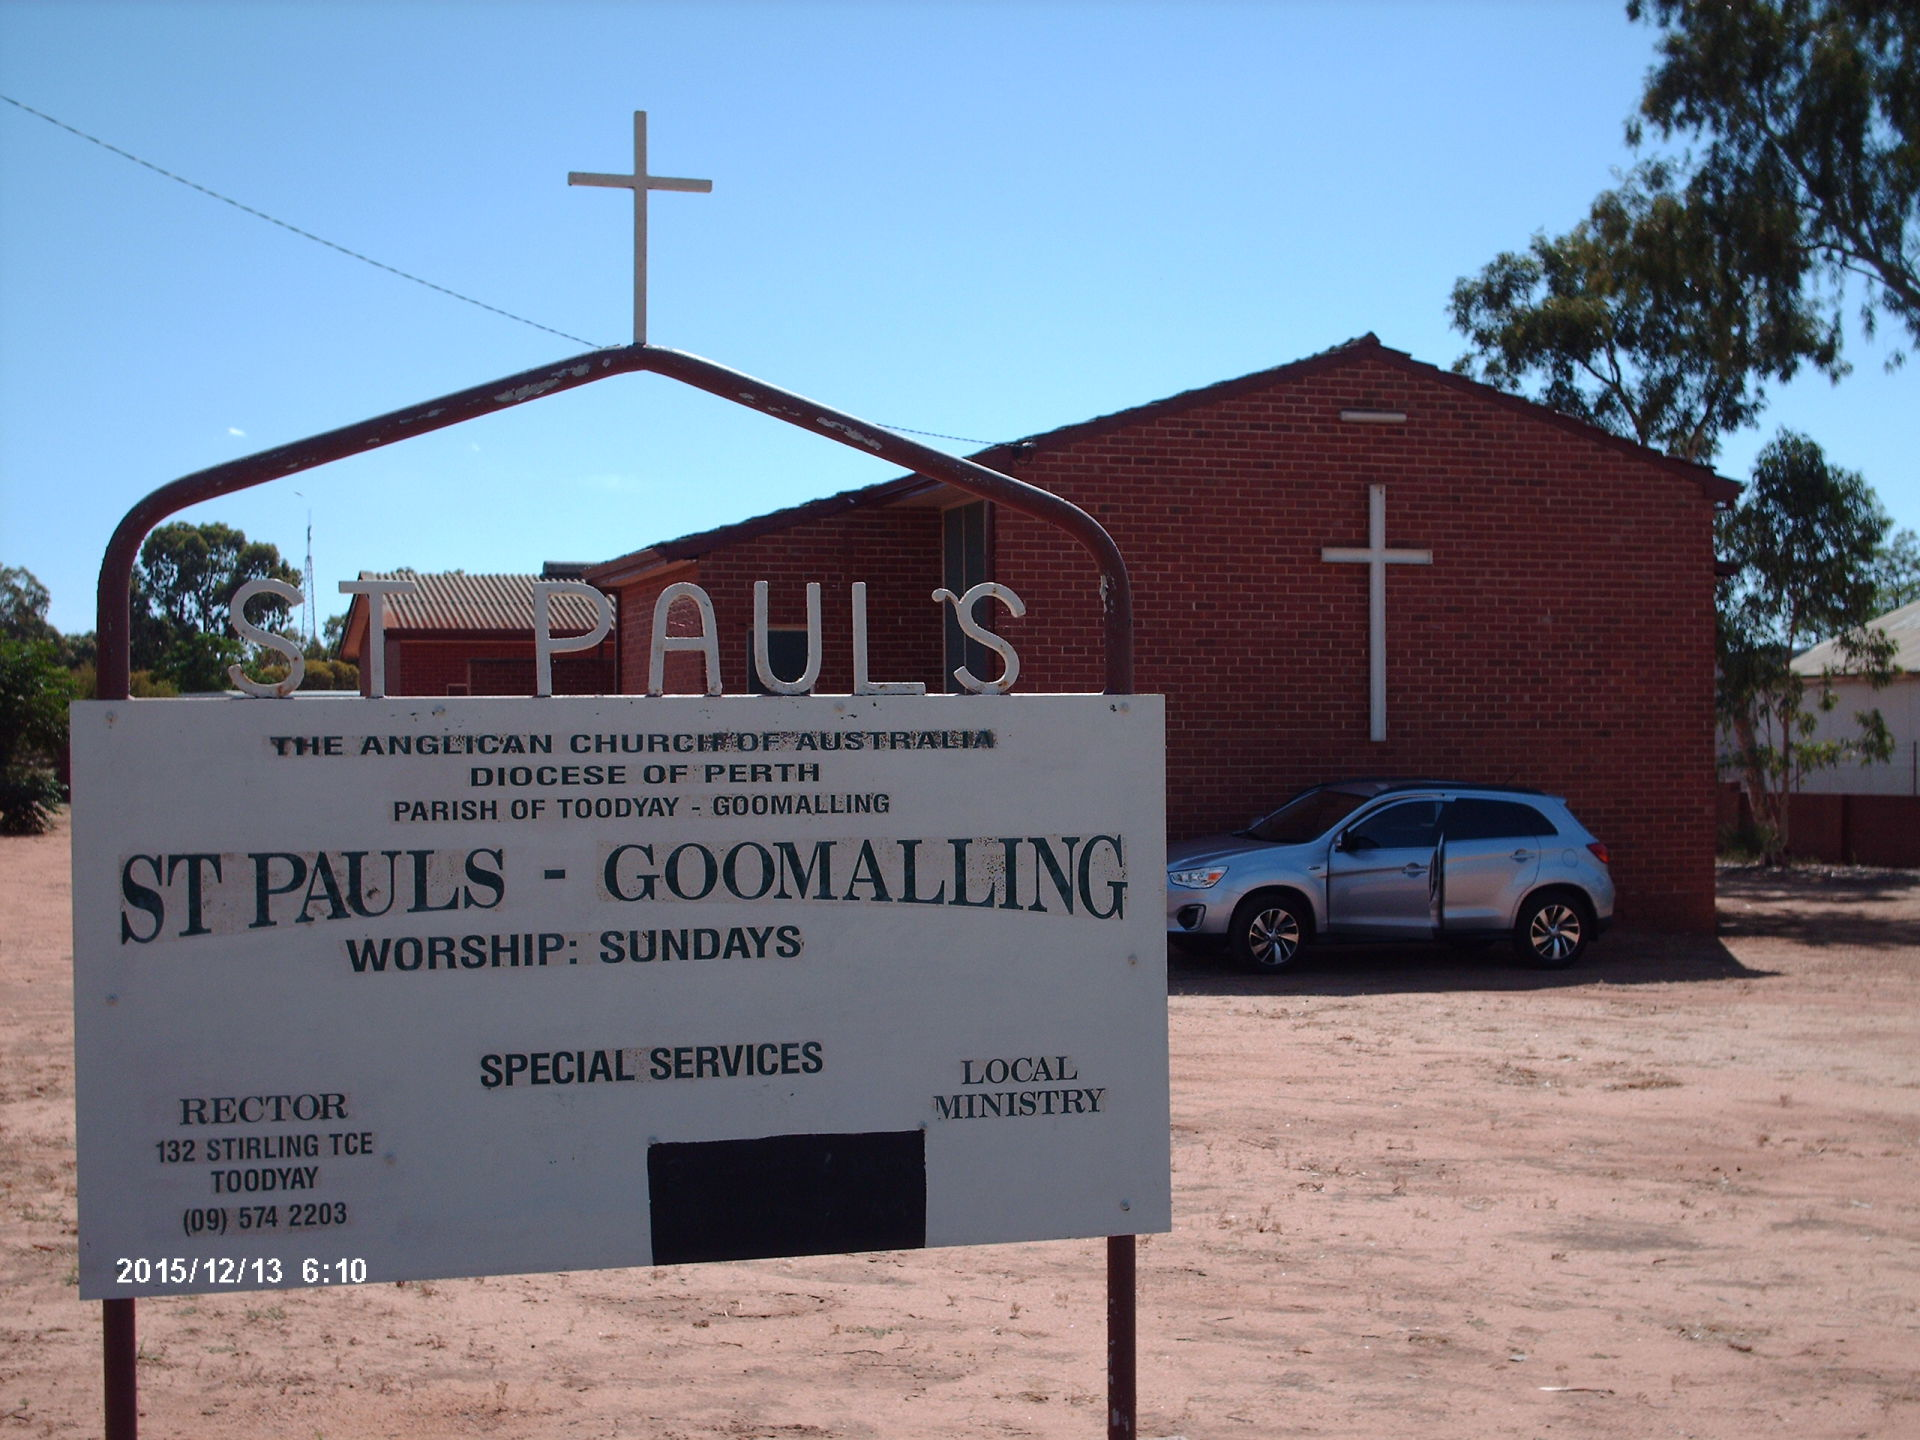 St Paul's Goomalling